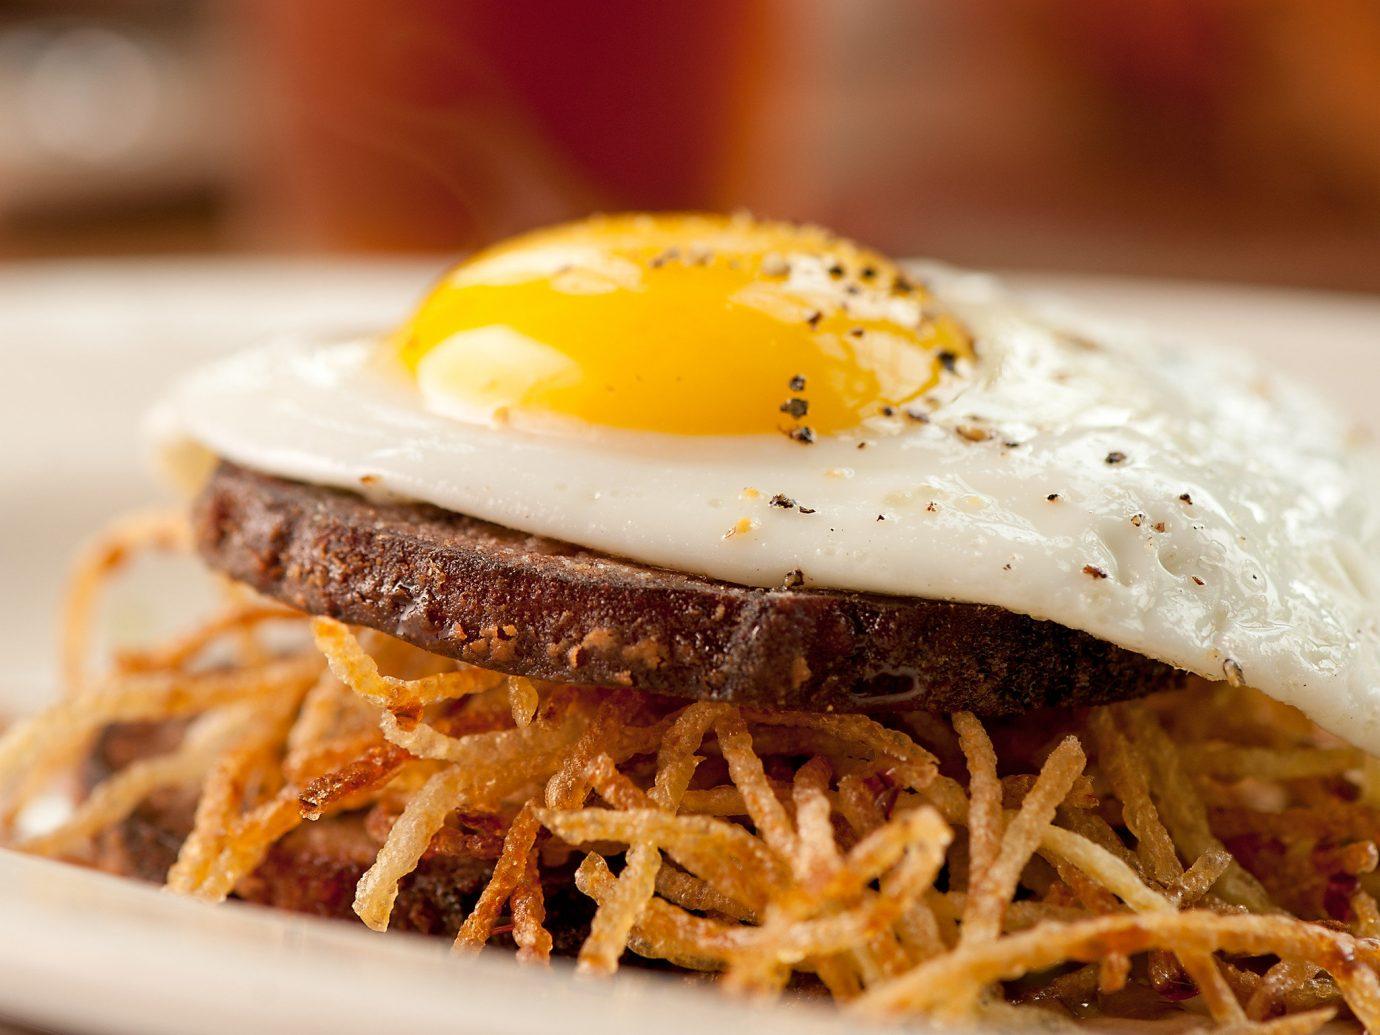 Food + Drink food indoor dish plate meal breakfast cuisine meat produce pulled pork hamburger close